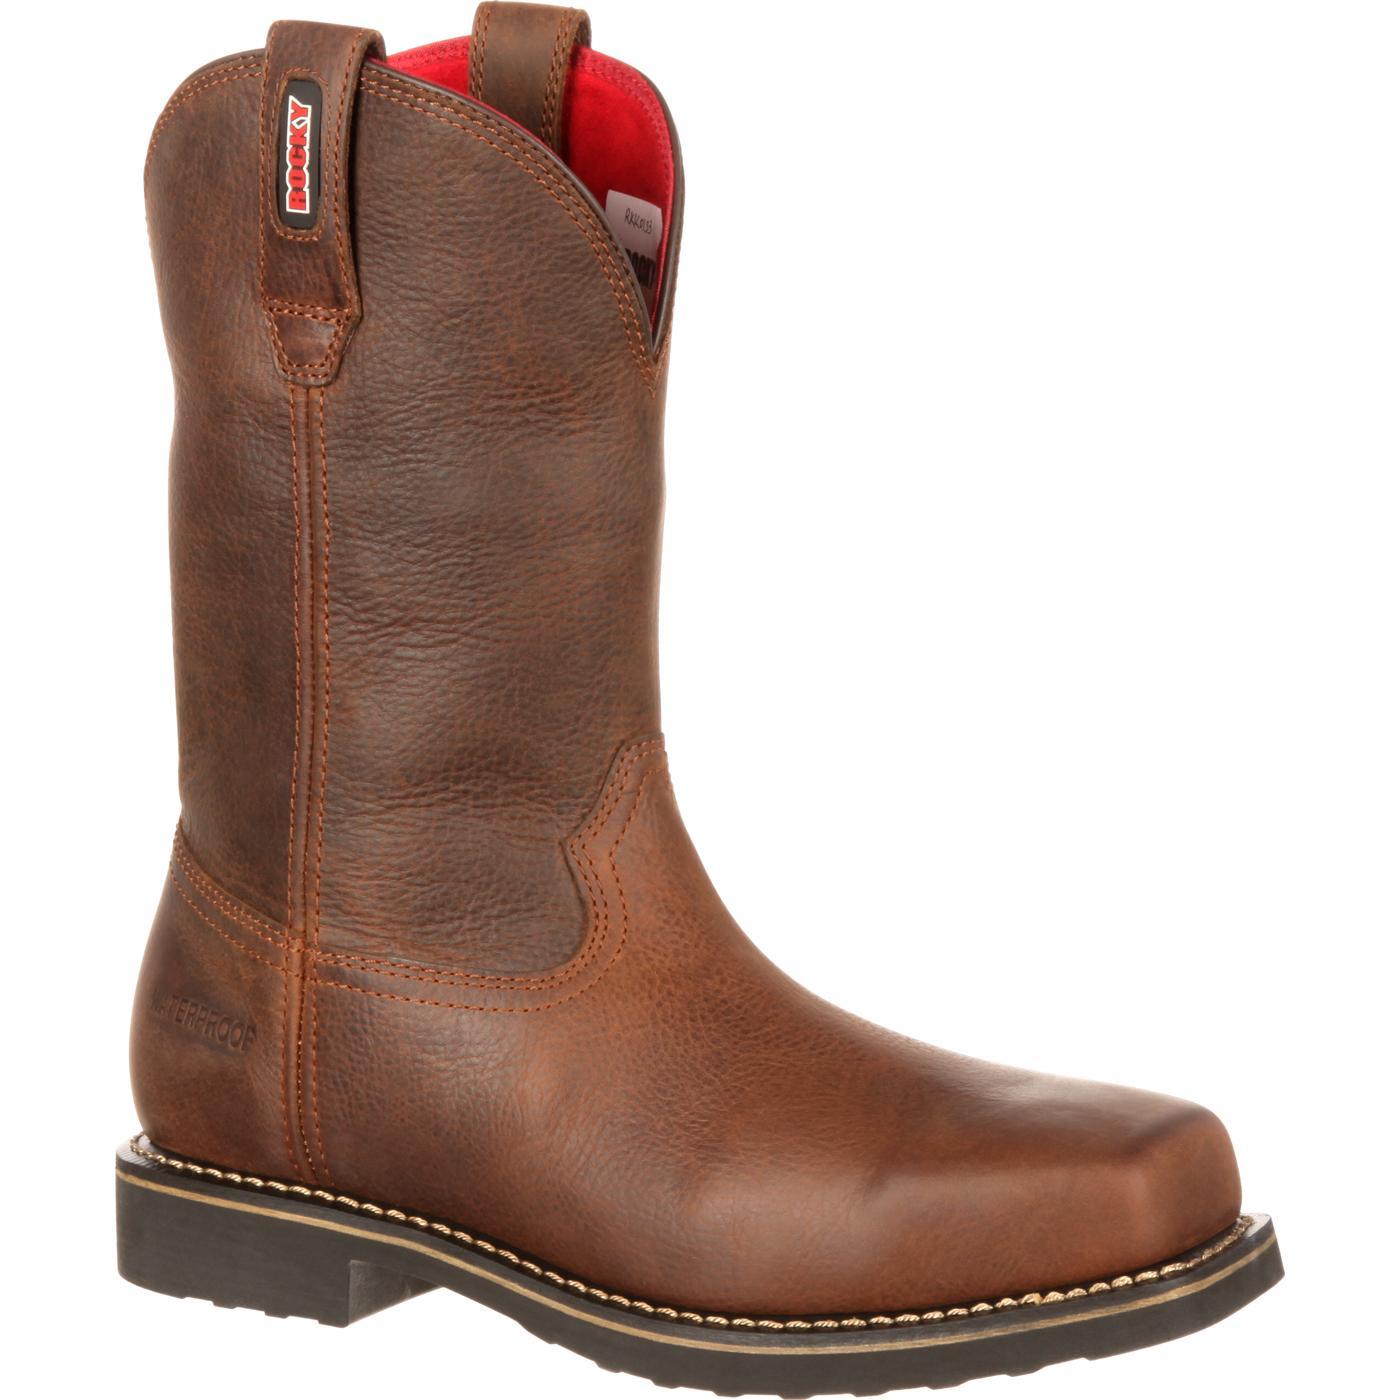 boots justin briar comfortable lace steel roper pitstop s comfort comforter double st work up toe men